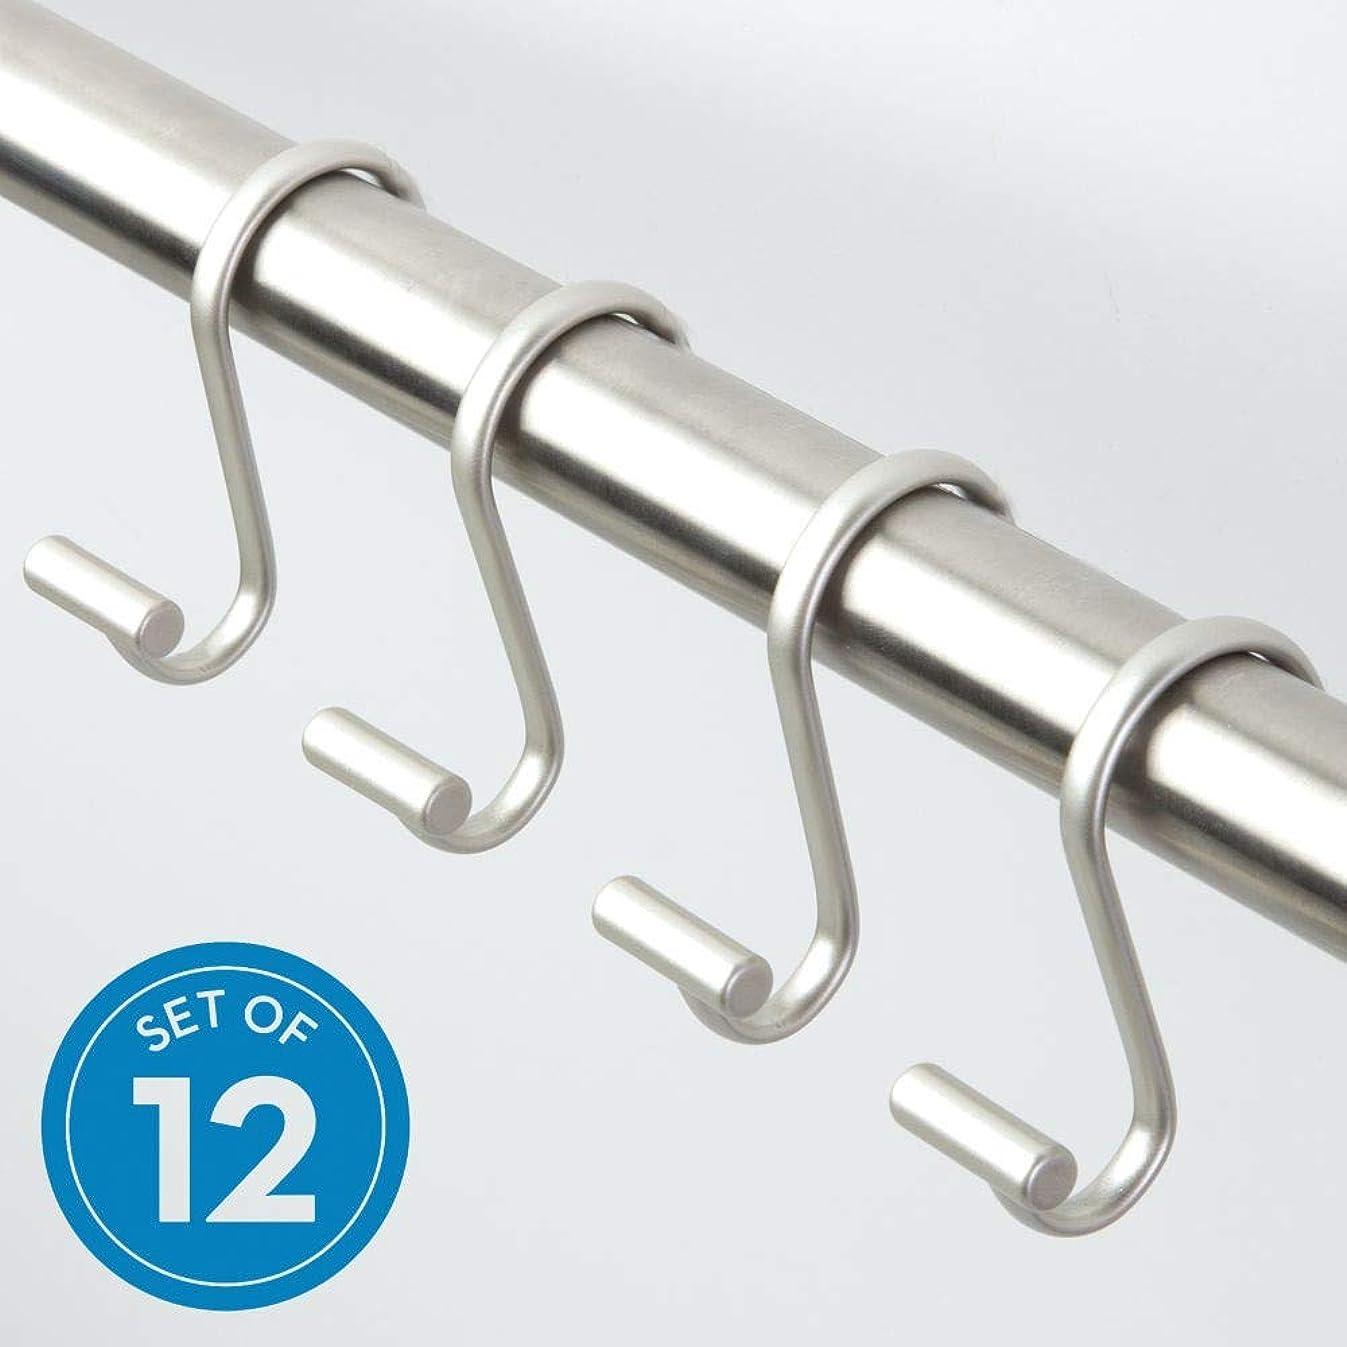 InterDesign Metal T-Bar Shower Curtain Hooks Rust Resistant Rings for Kid's, Guest, Master Bathroom, 1